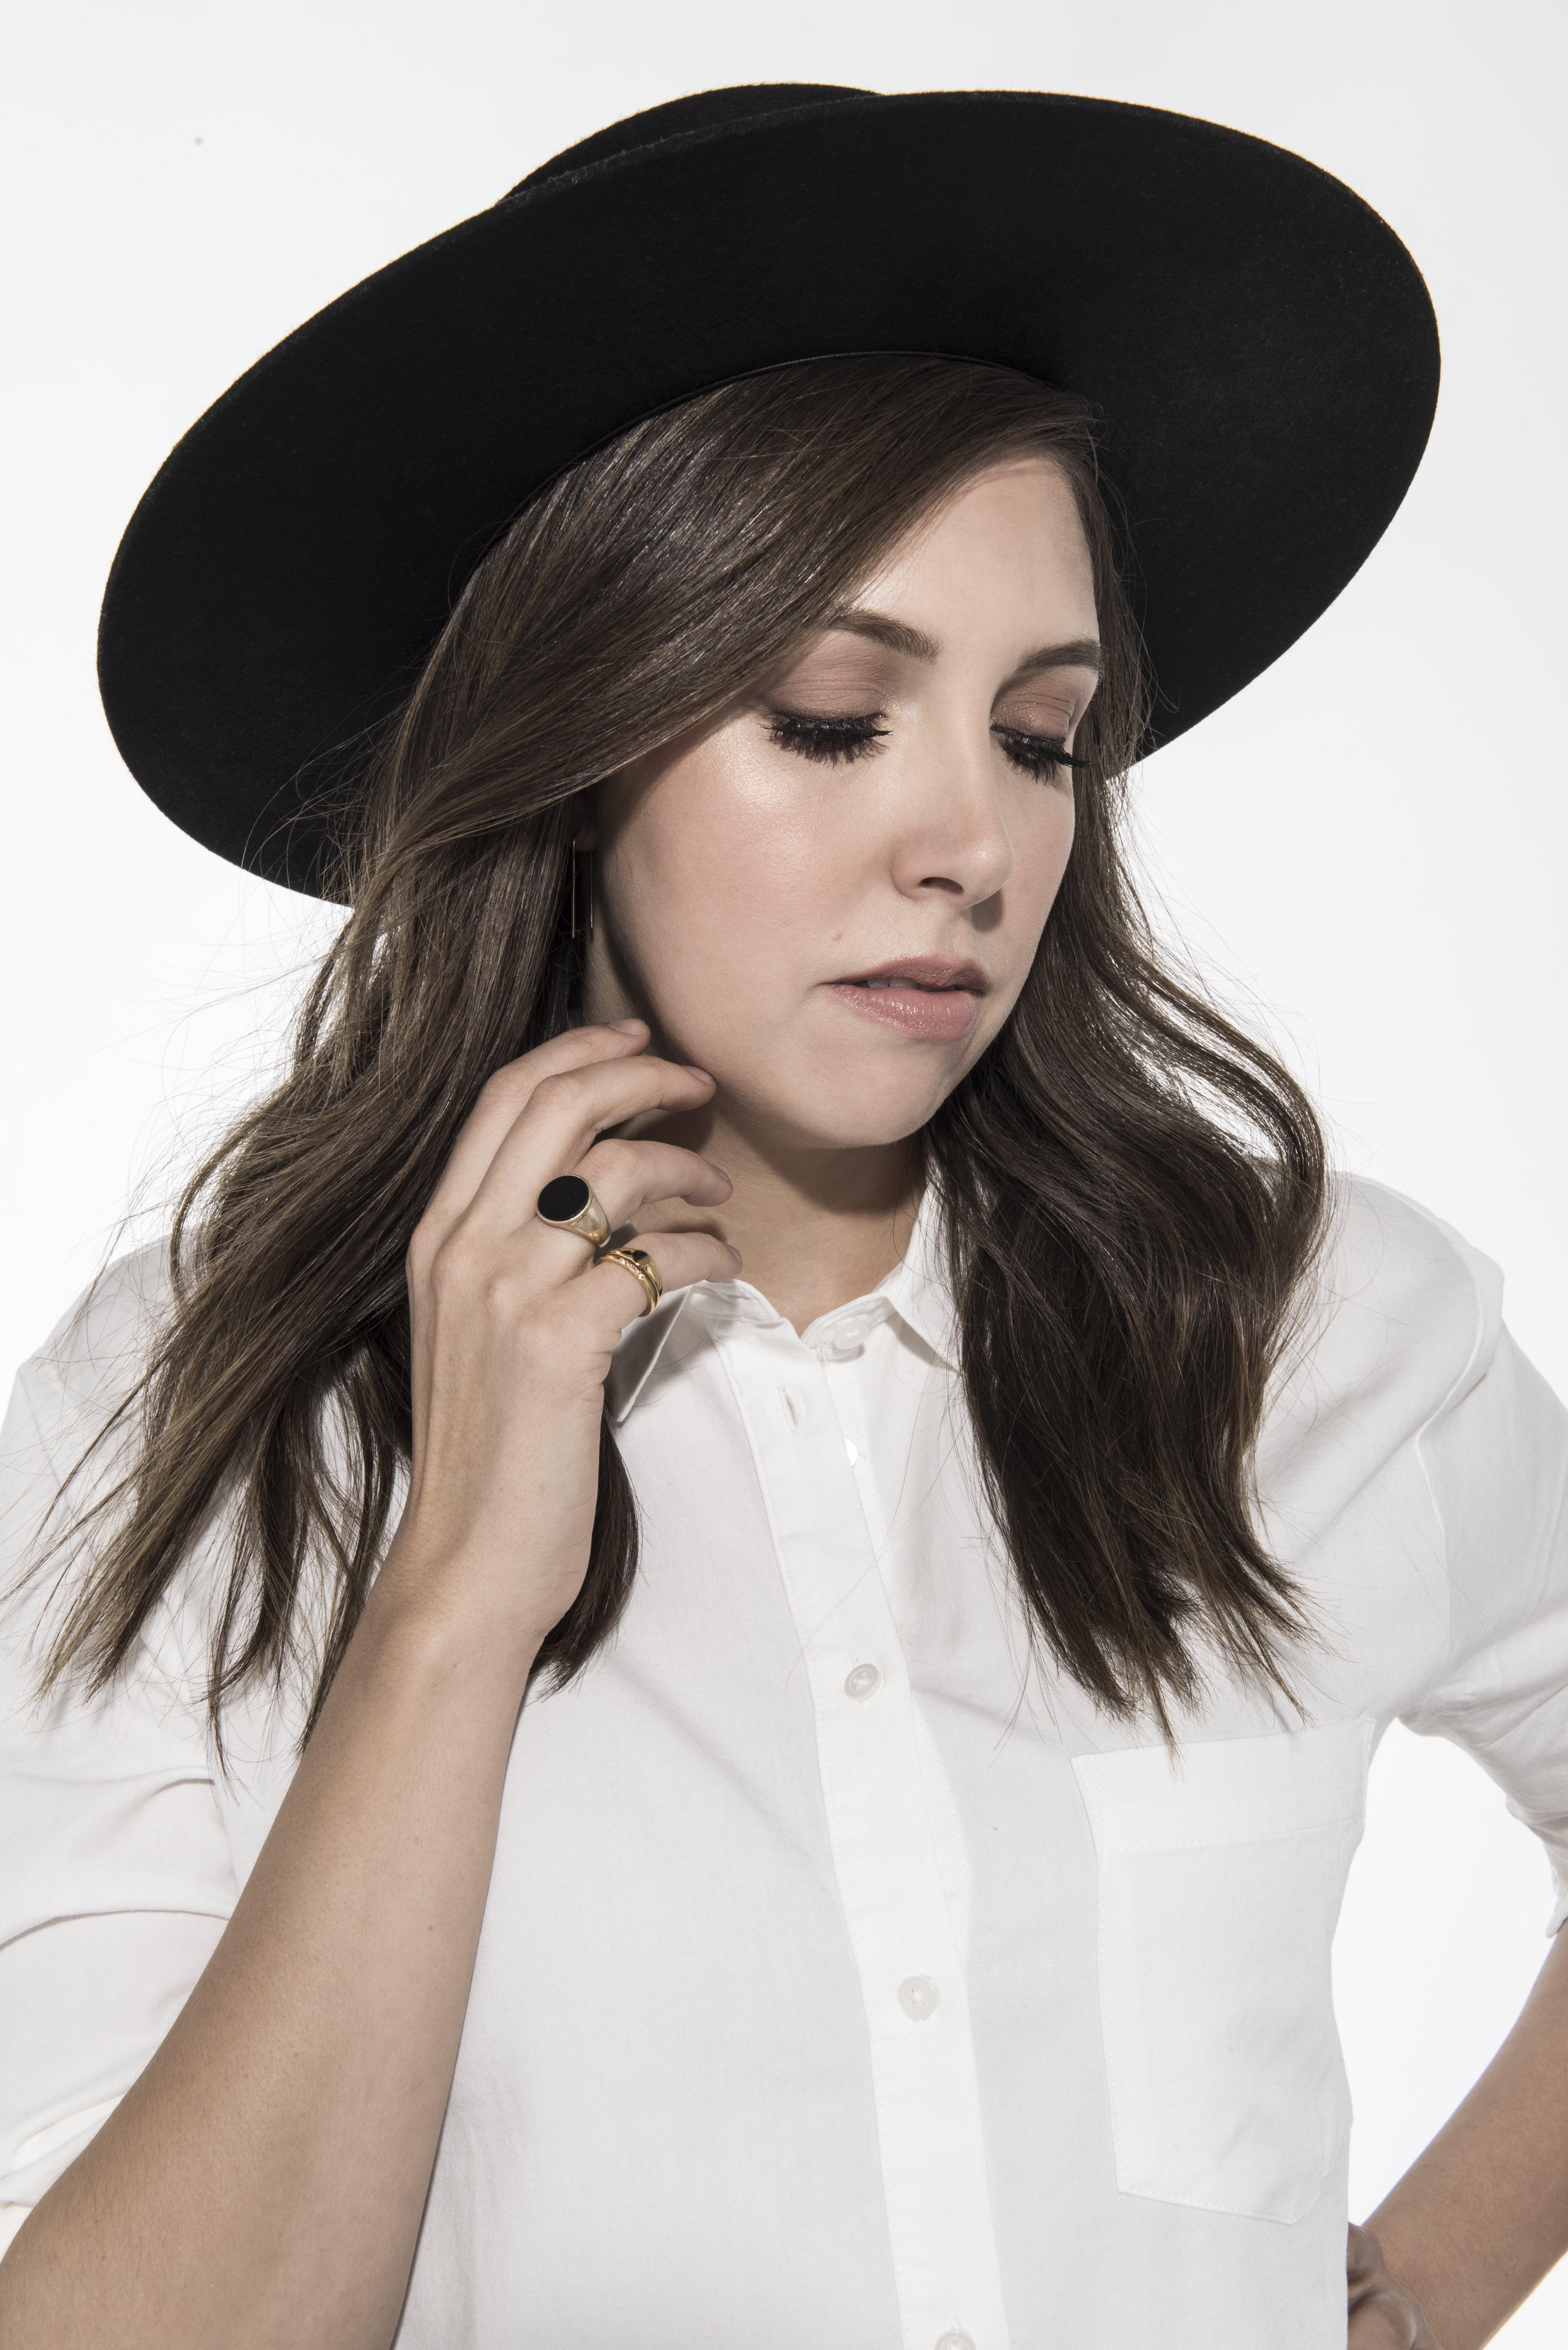 Francesca Battistelli as featured on Jesus Calling podcast